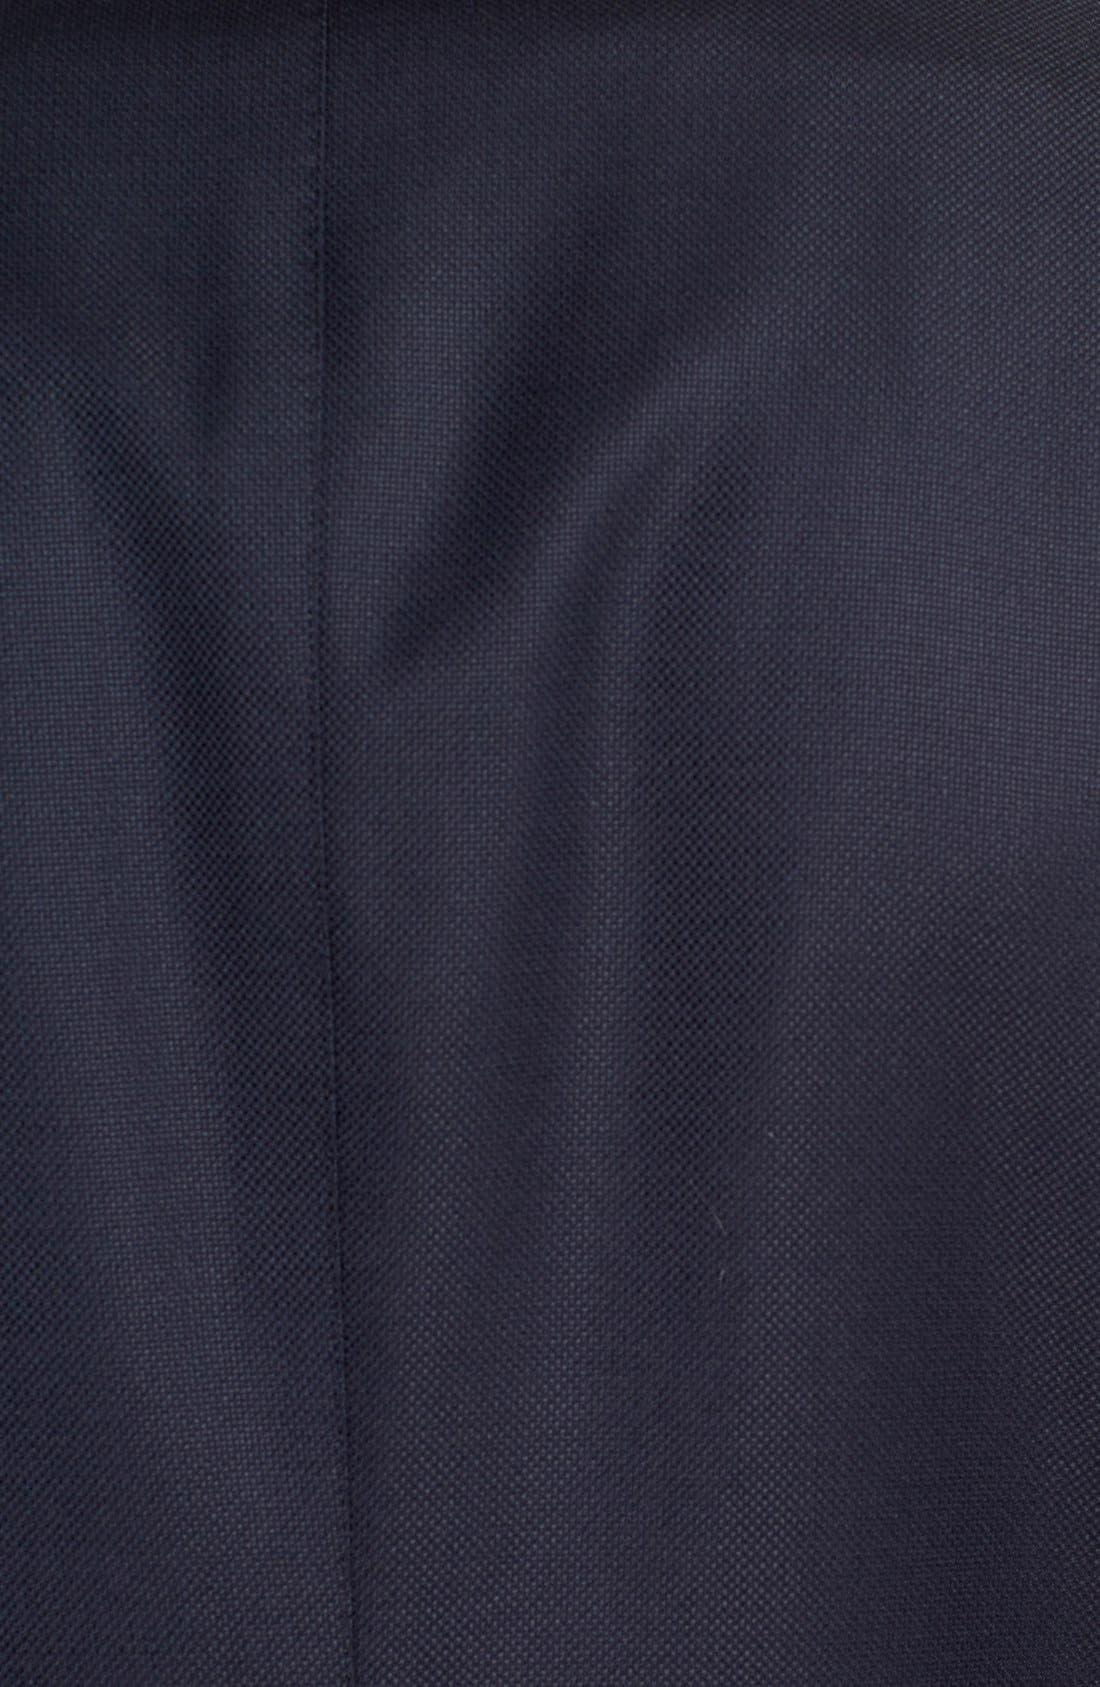 Classic Fit Wool Blazer,                             Alternate thumbnail 5, color,                             410